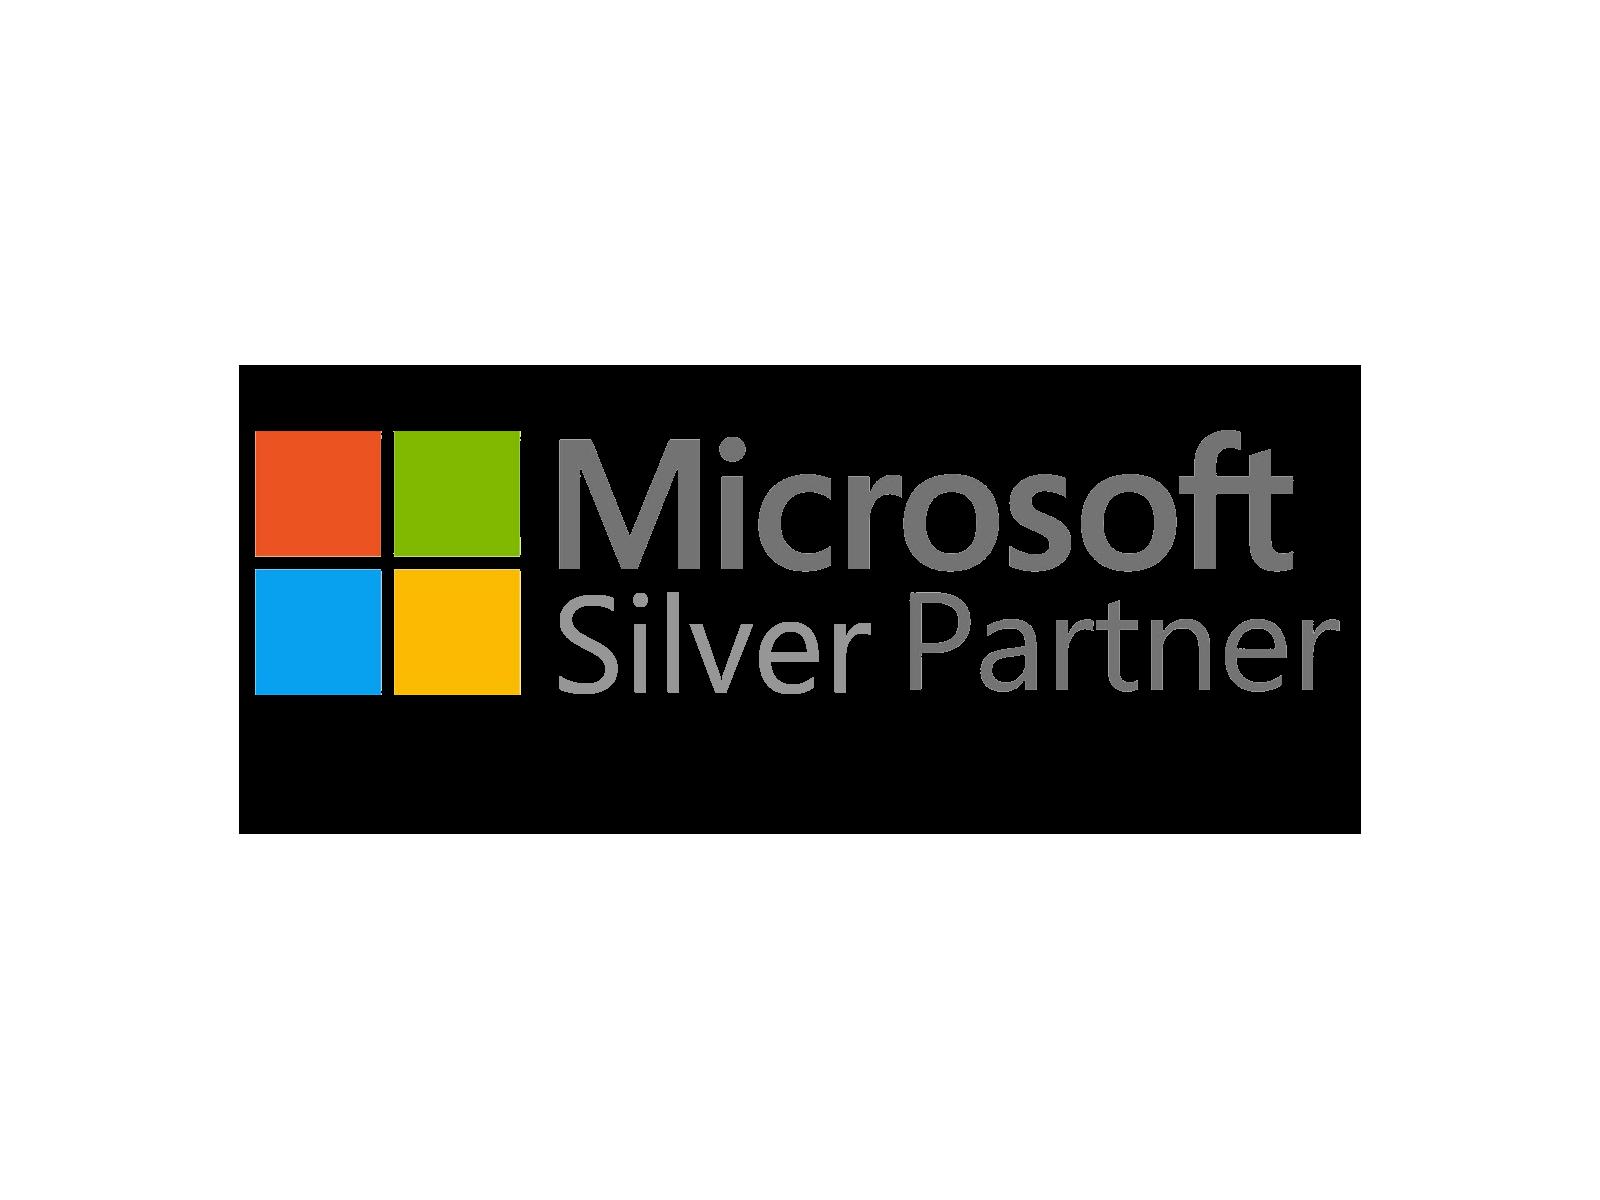 microsoft-silver-partner.1600.1200.0.1.t